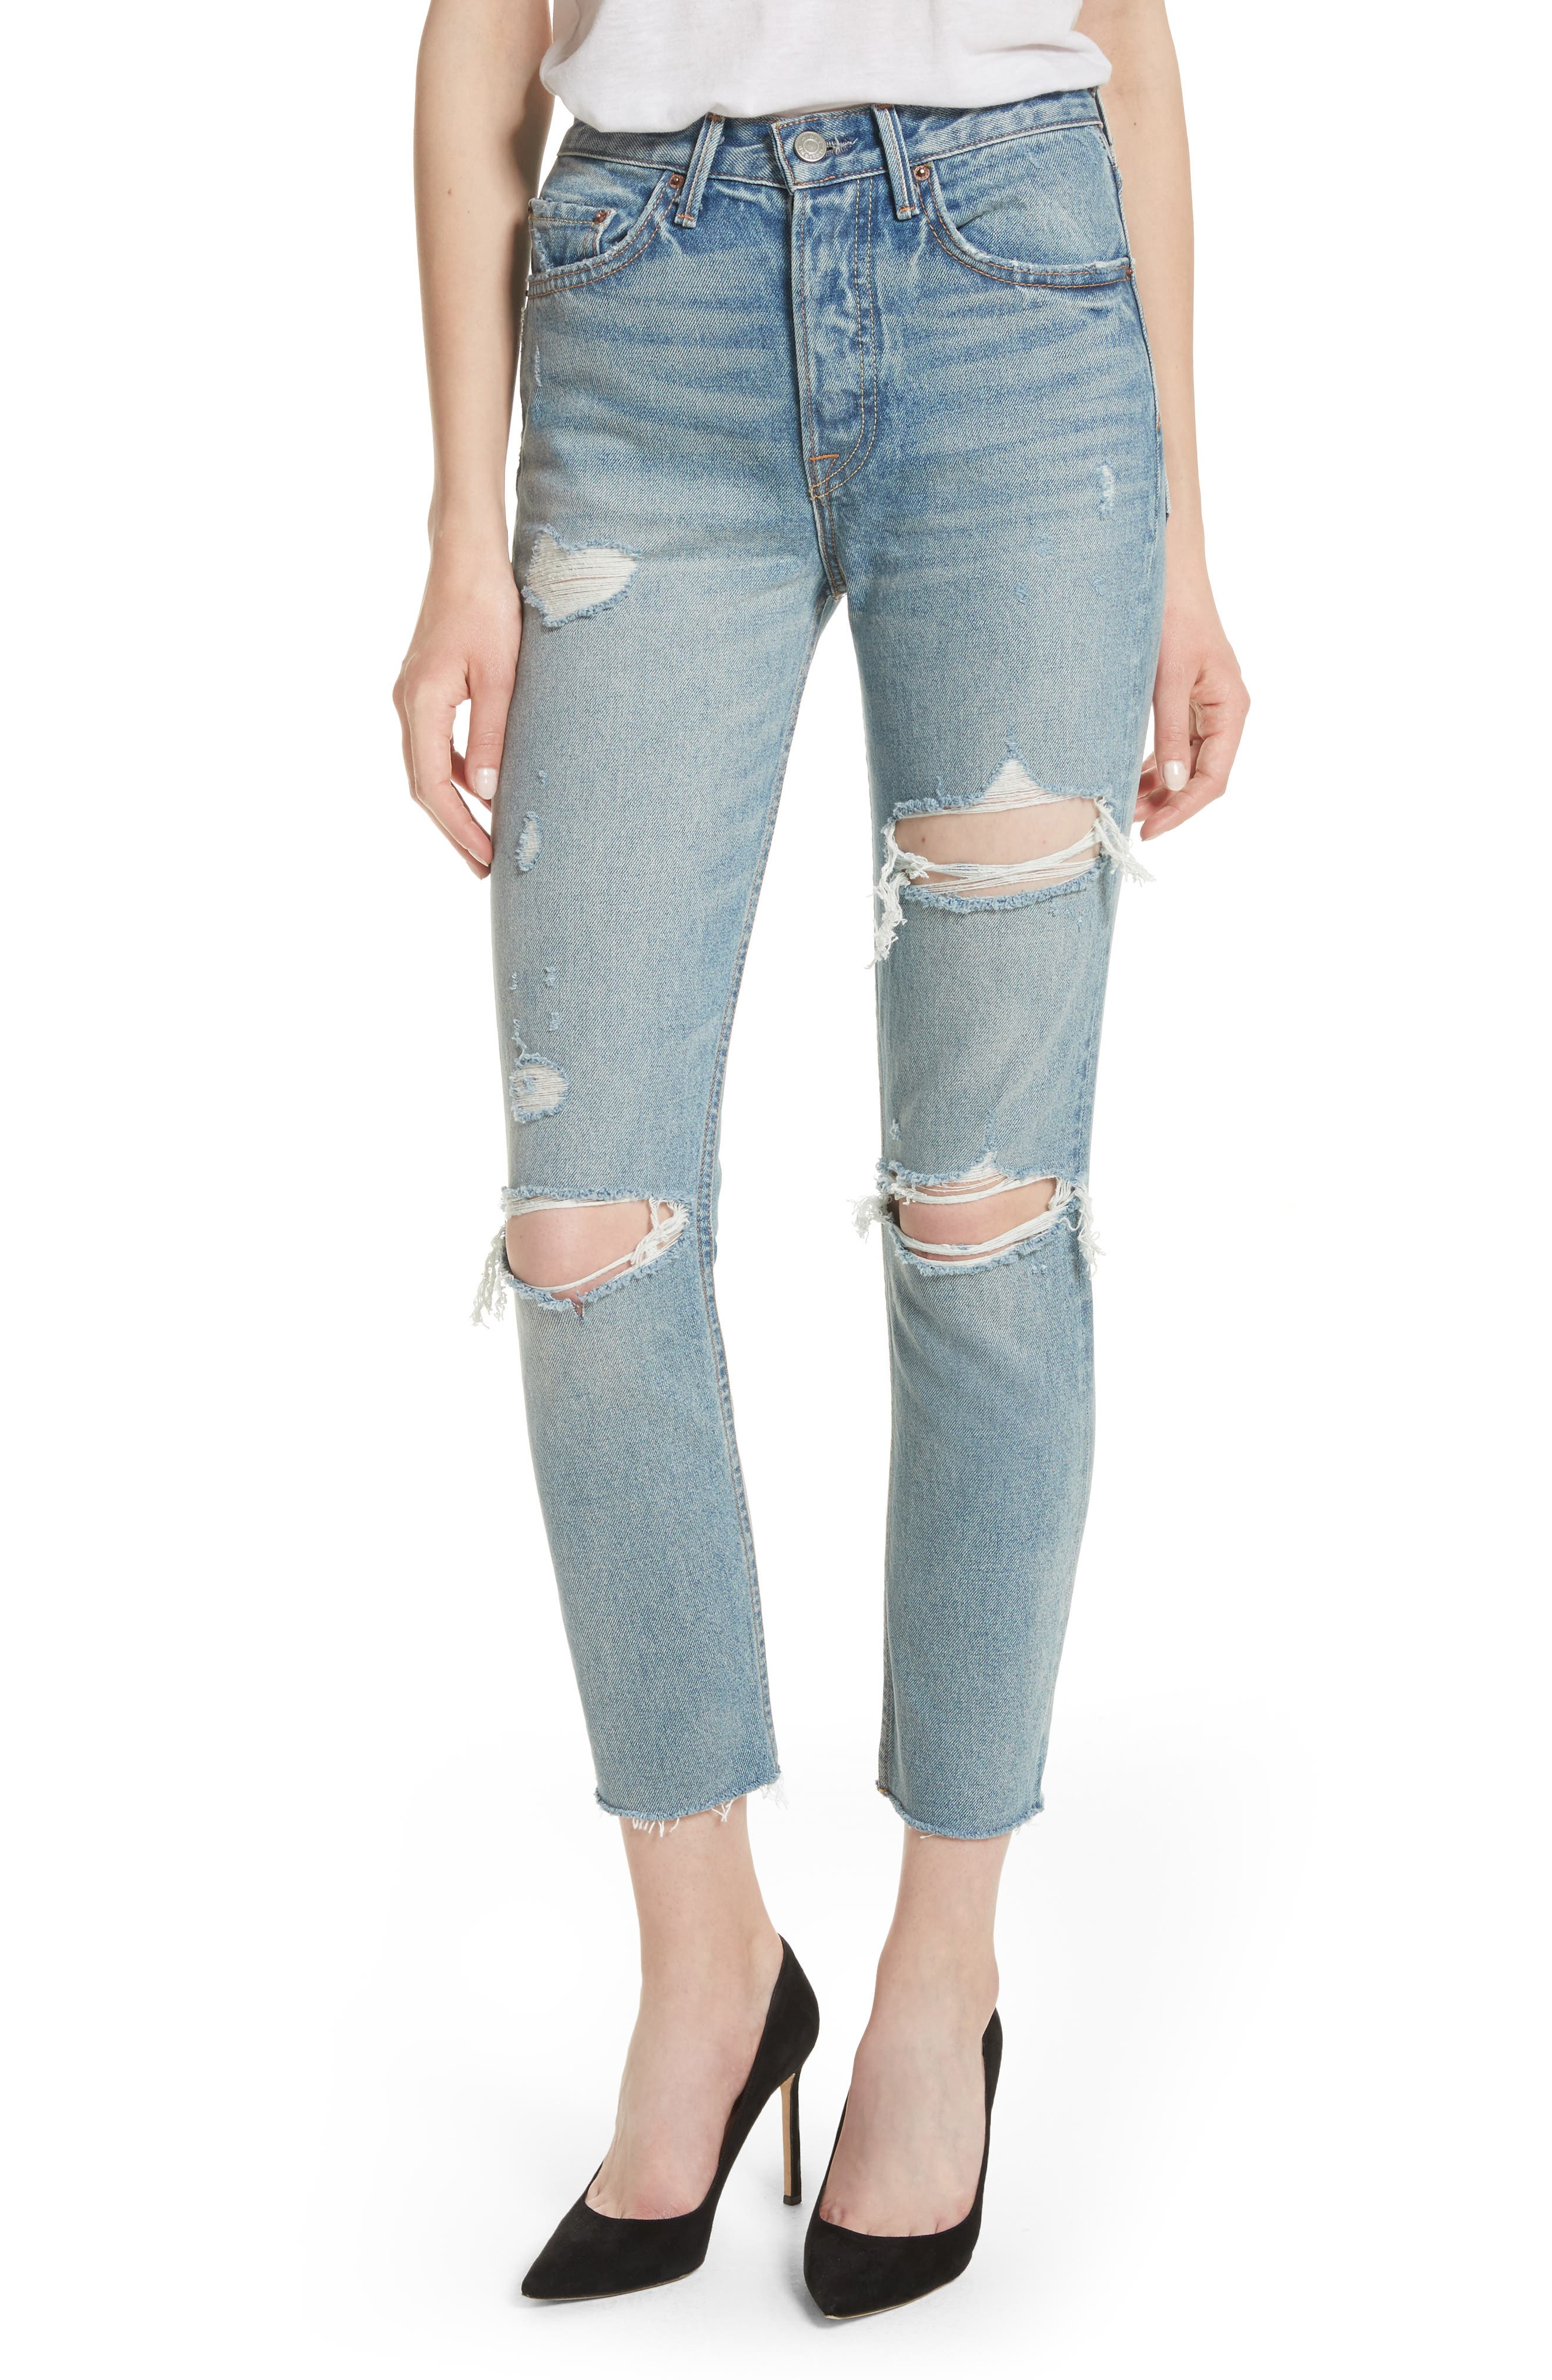 Main Image - GRLFRND Karolina Rigid High Waist Skinny Jeans (Regular & Petite)  (A Little More Love)